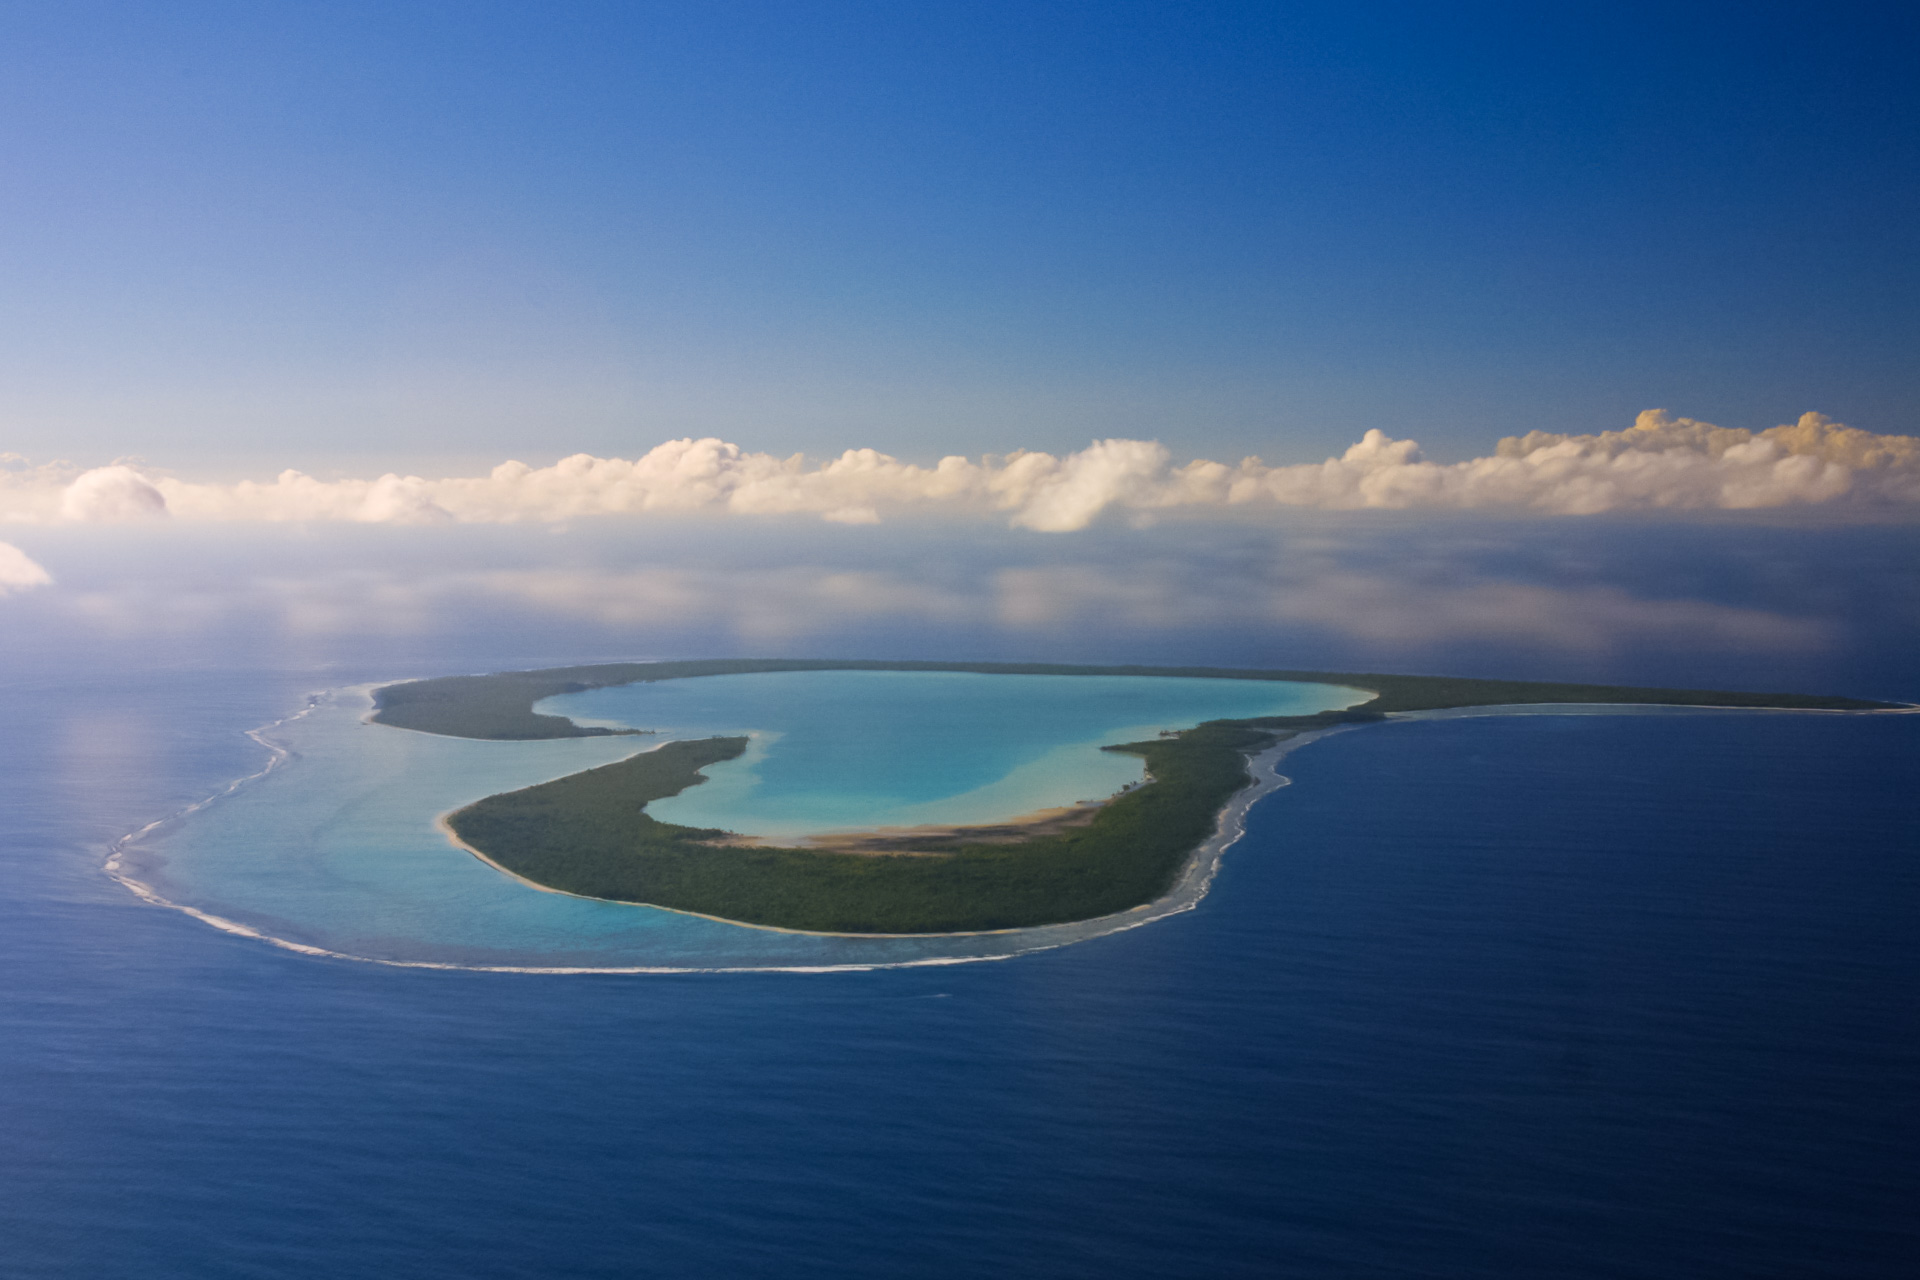 The heart-shaped island of Tupai